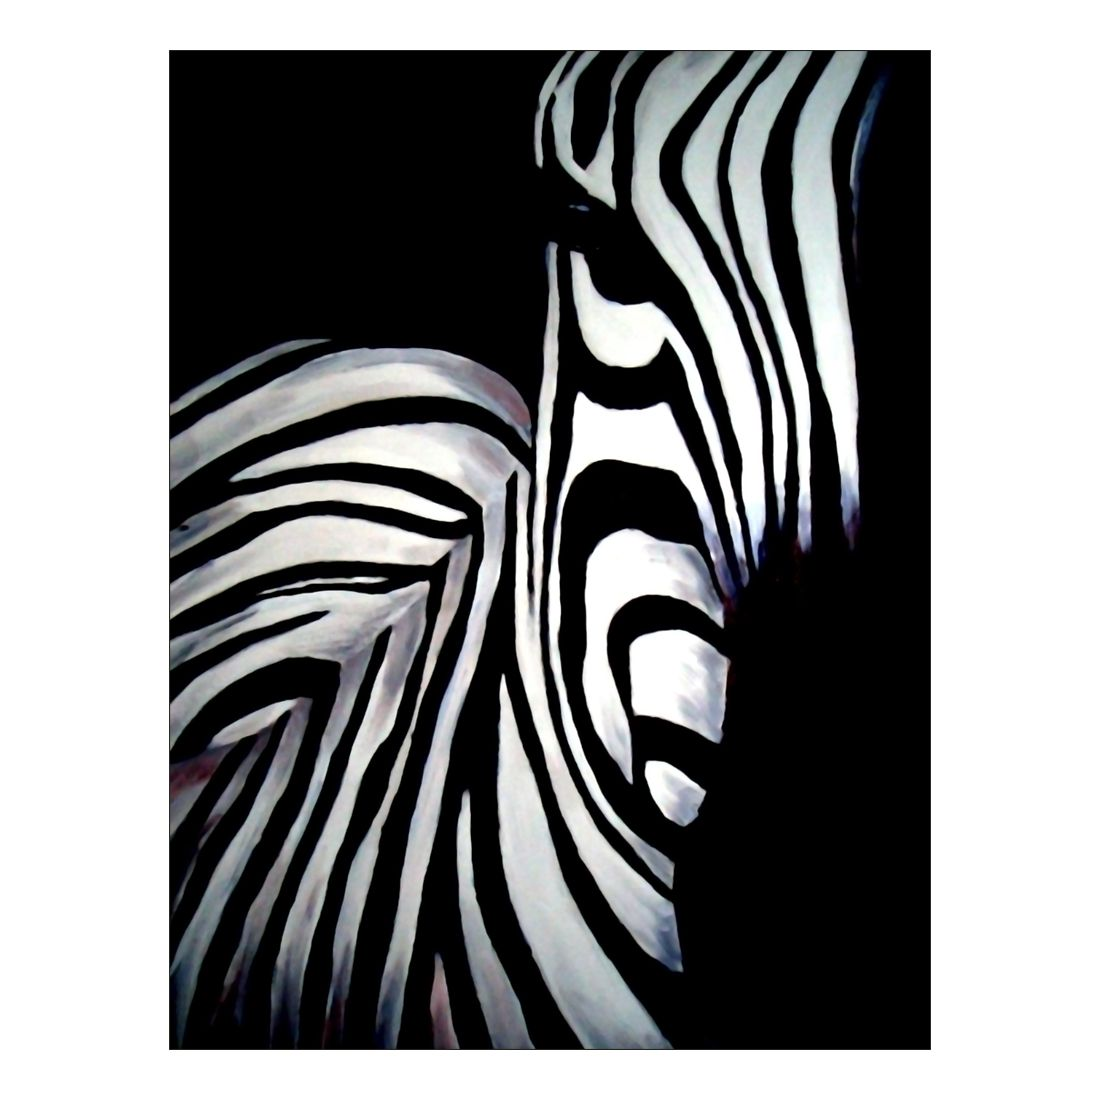 Leinwandbild Zebra – 100 x 75cm, Gallery of Innovative Art jetzt kaufen